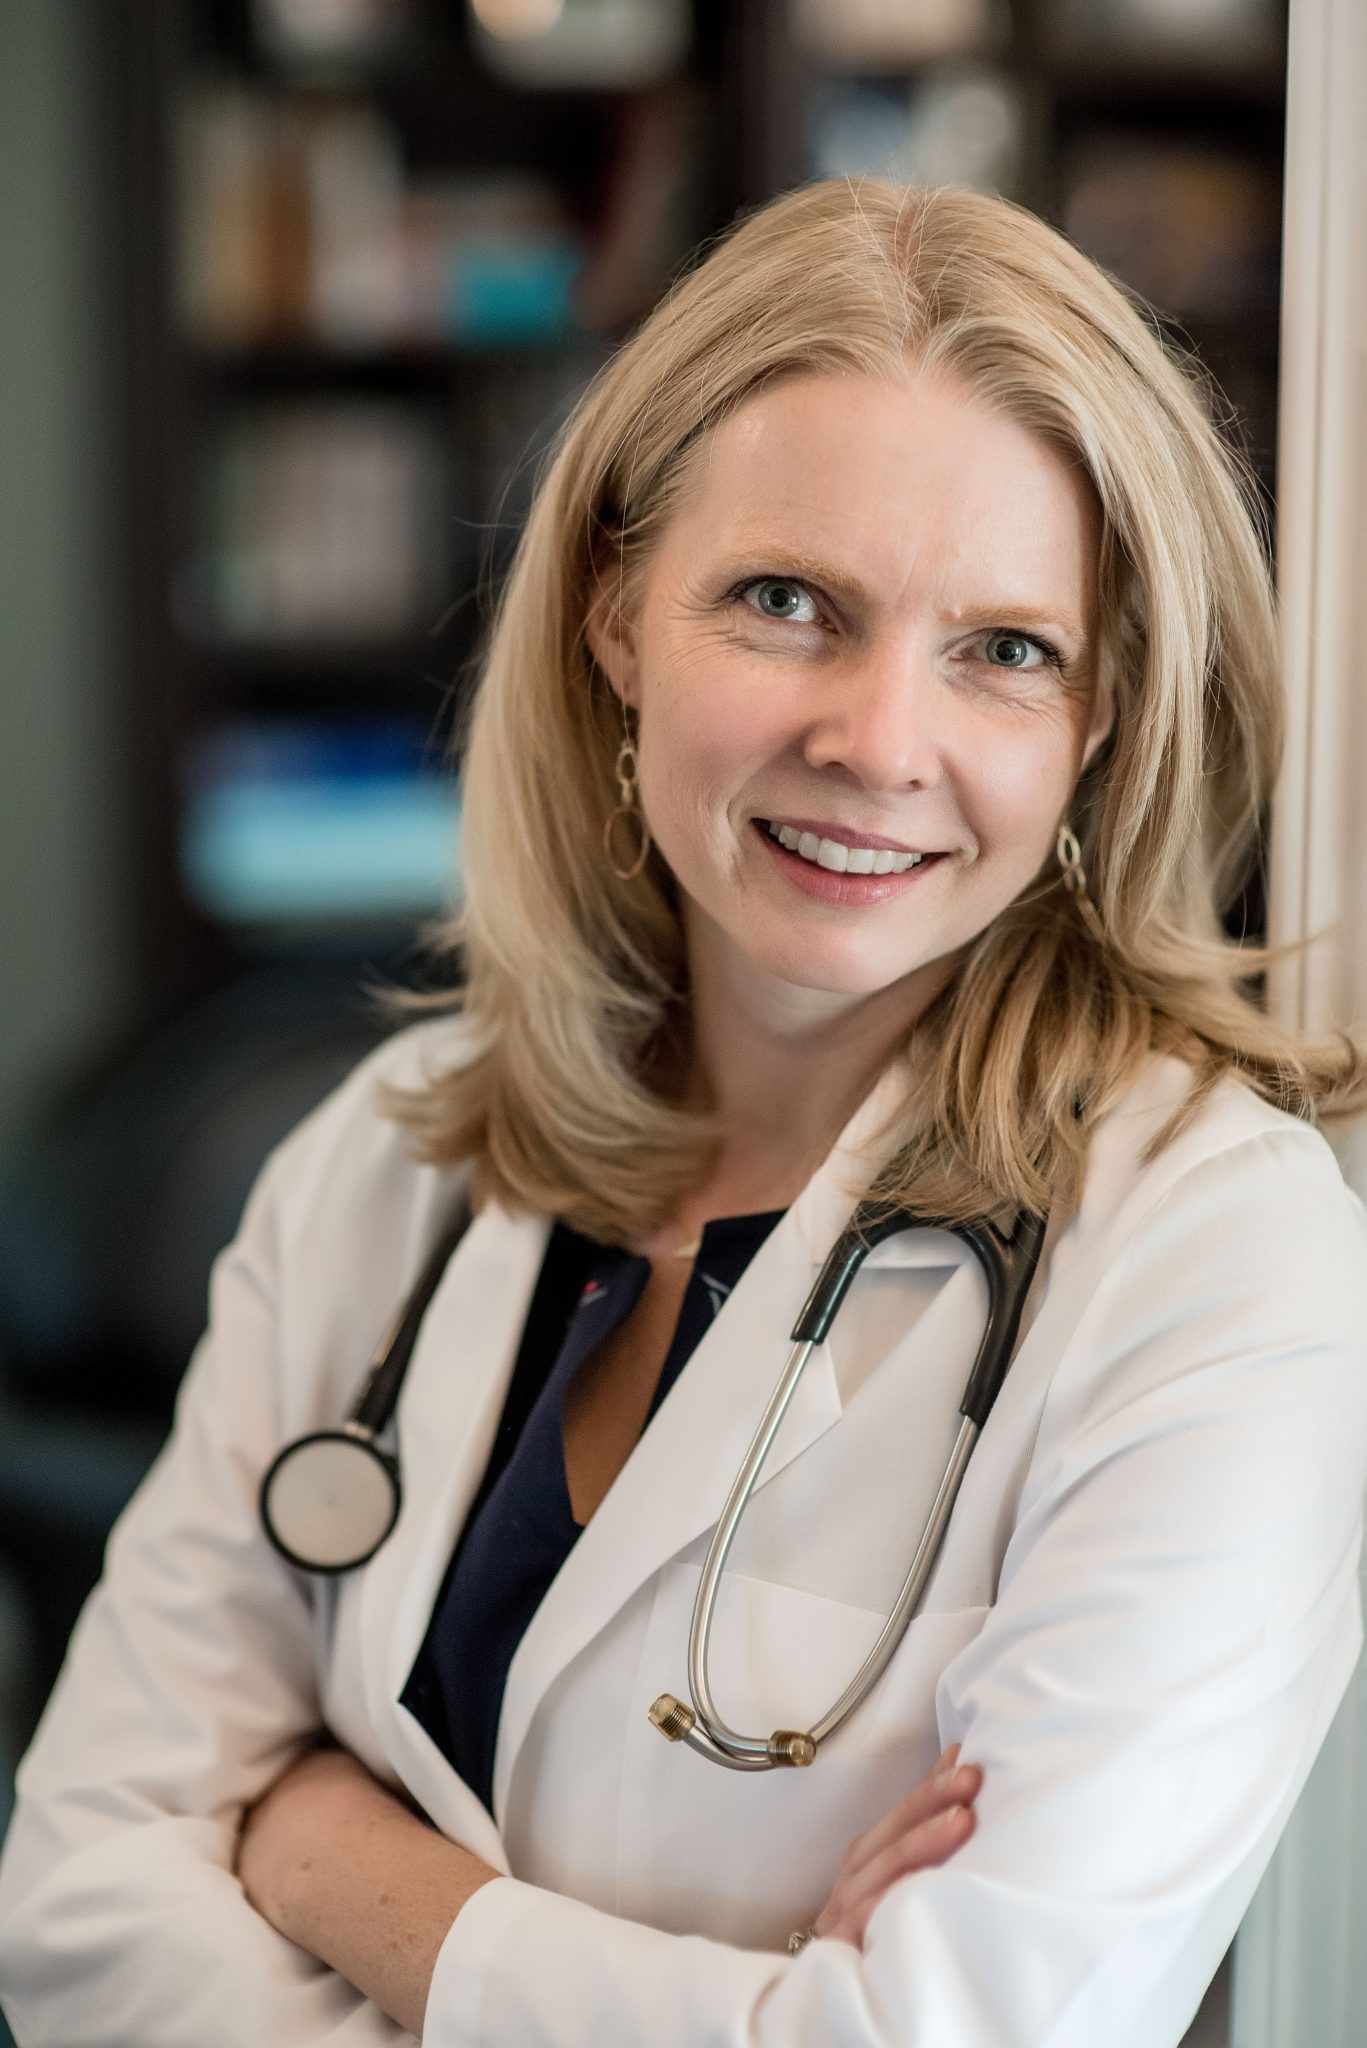 headshot of Dr LaSalle